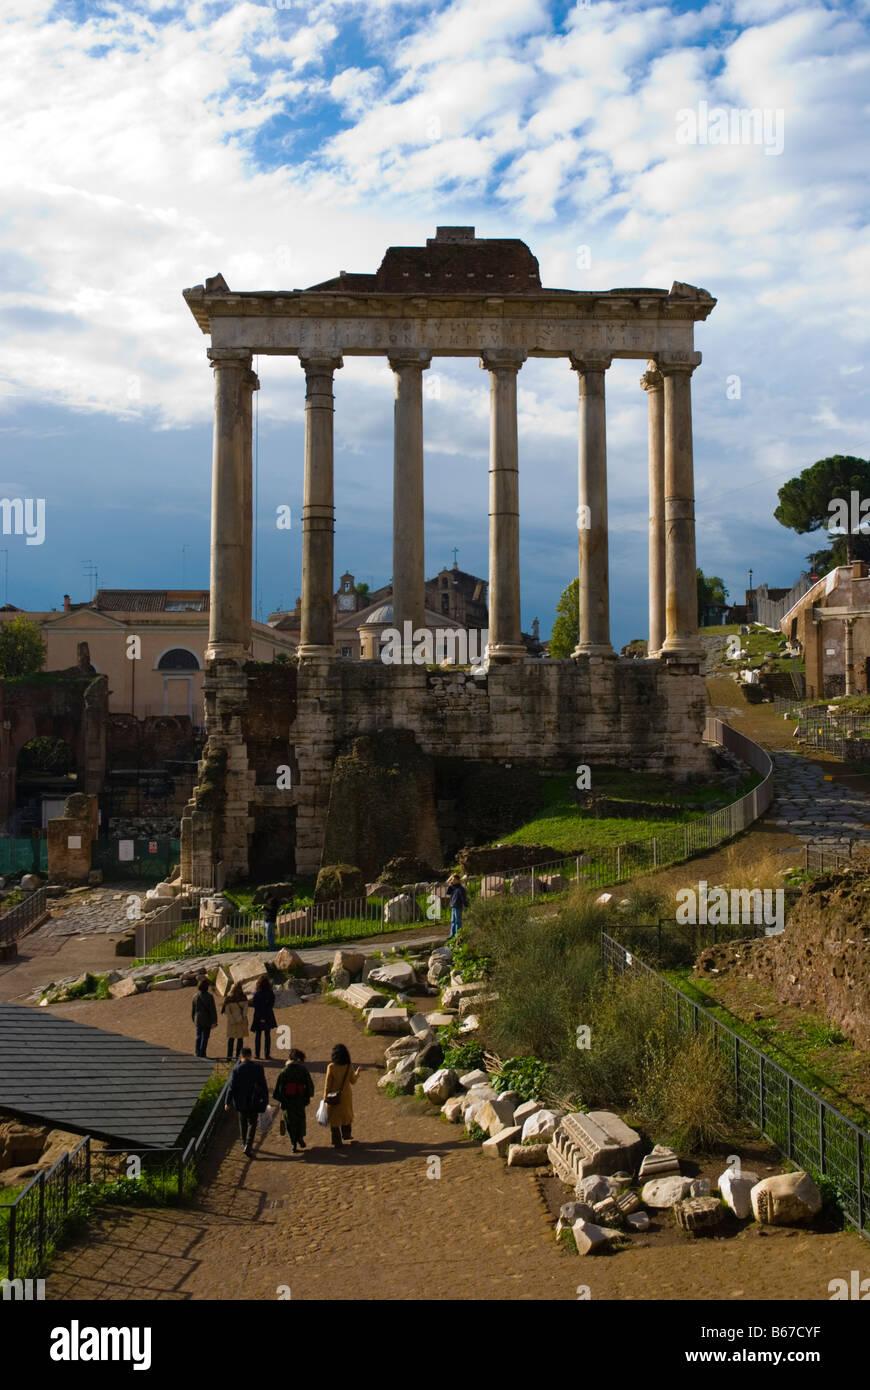 Foro Romano the Roman forum in Rome Italy Europe - Stock Image